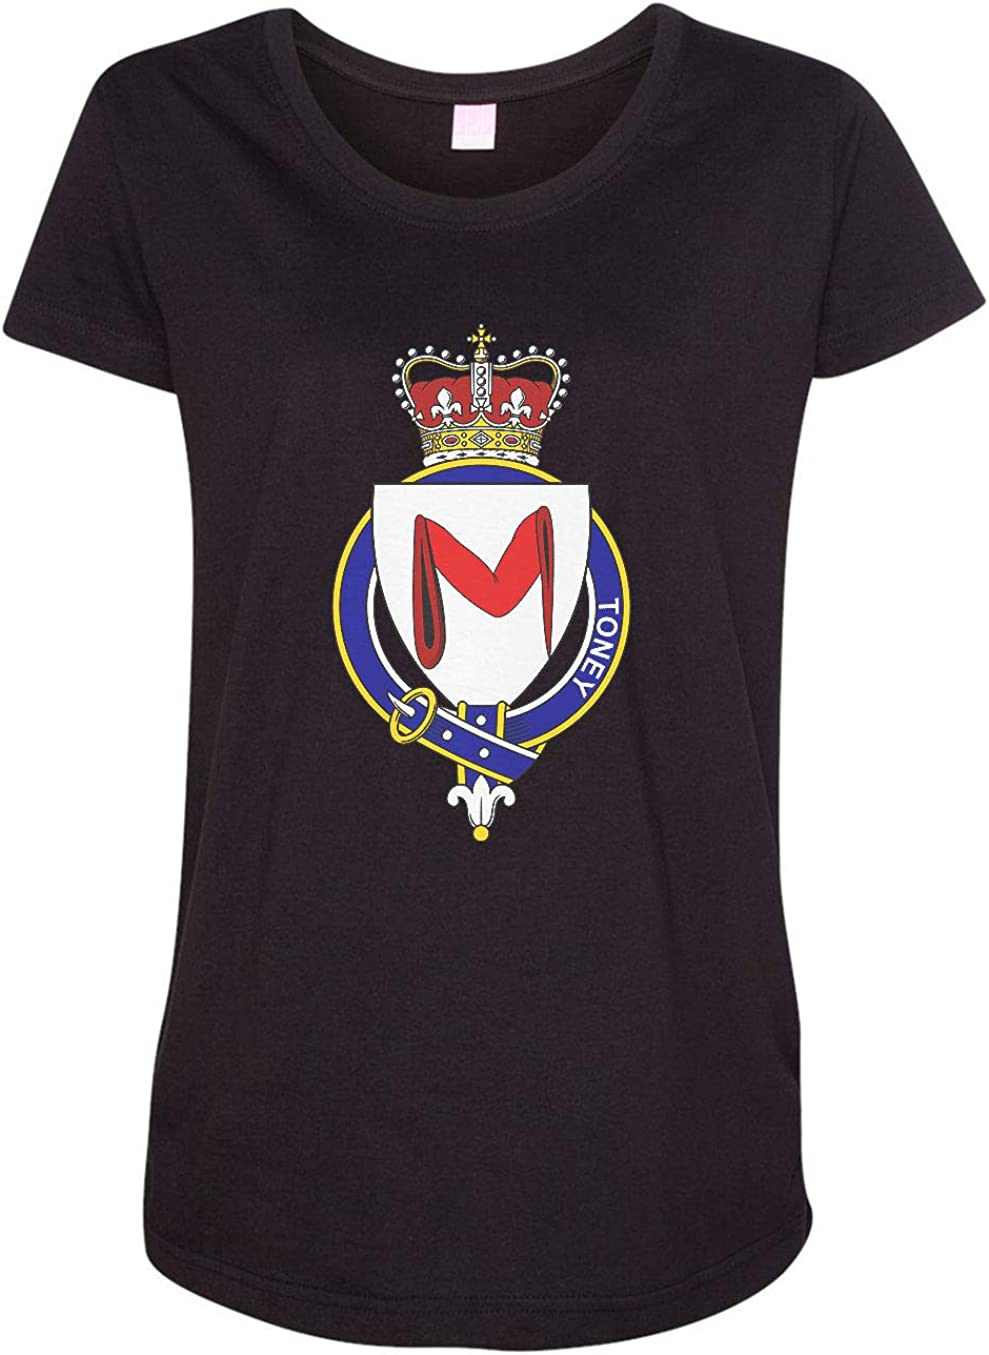 HARD EDGE DESIGN Women's English Garter Family Toney T-Shirt